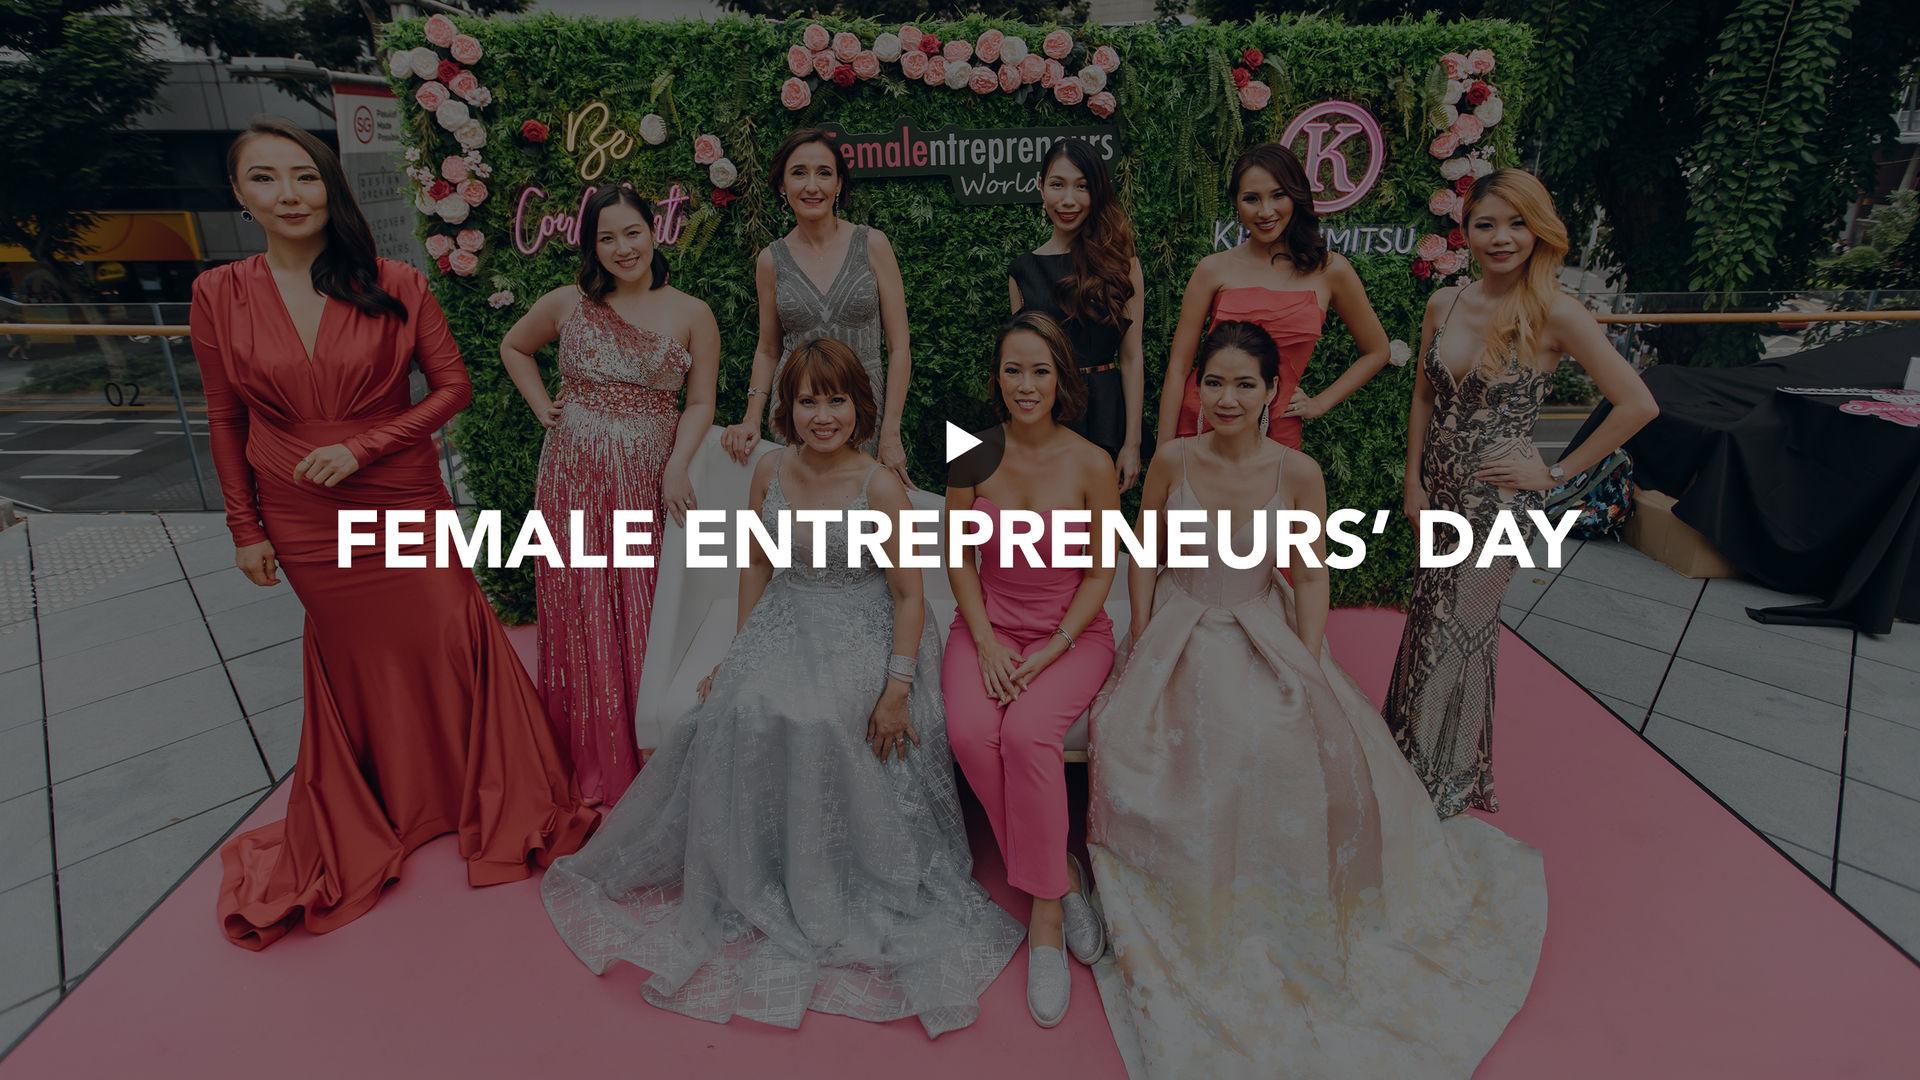 [FEW] Female Entreprenuers Day Singapore